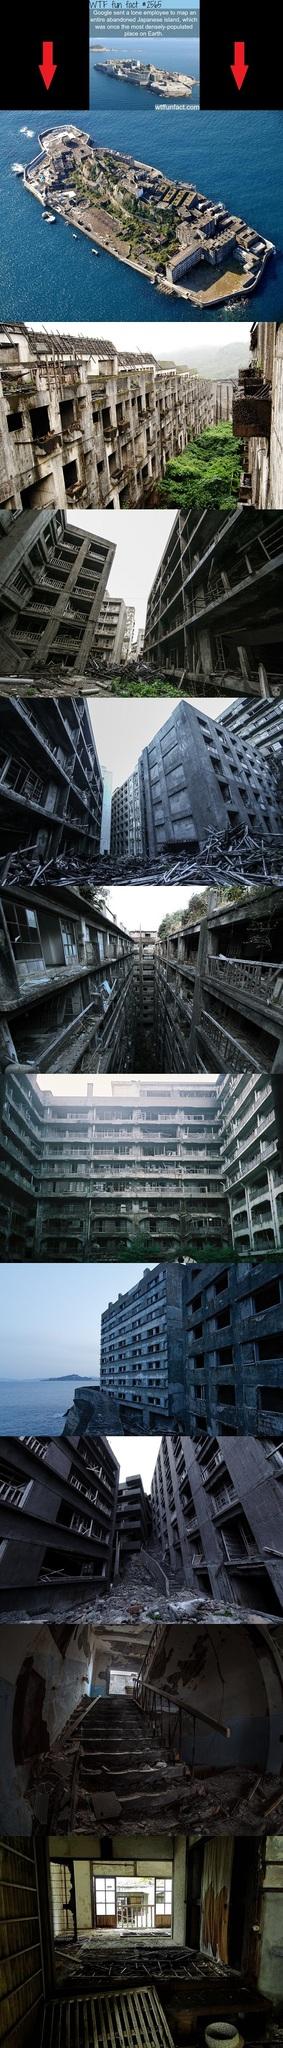 Hashima - Nope Island - meme